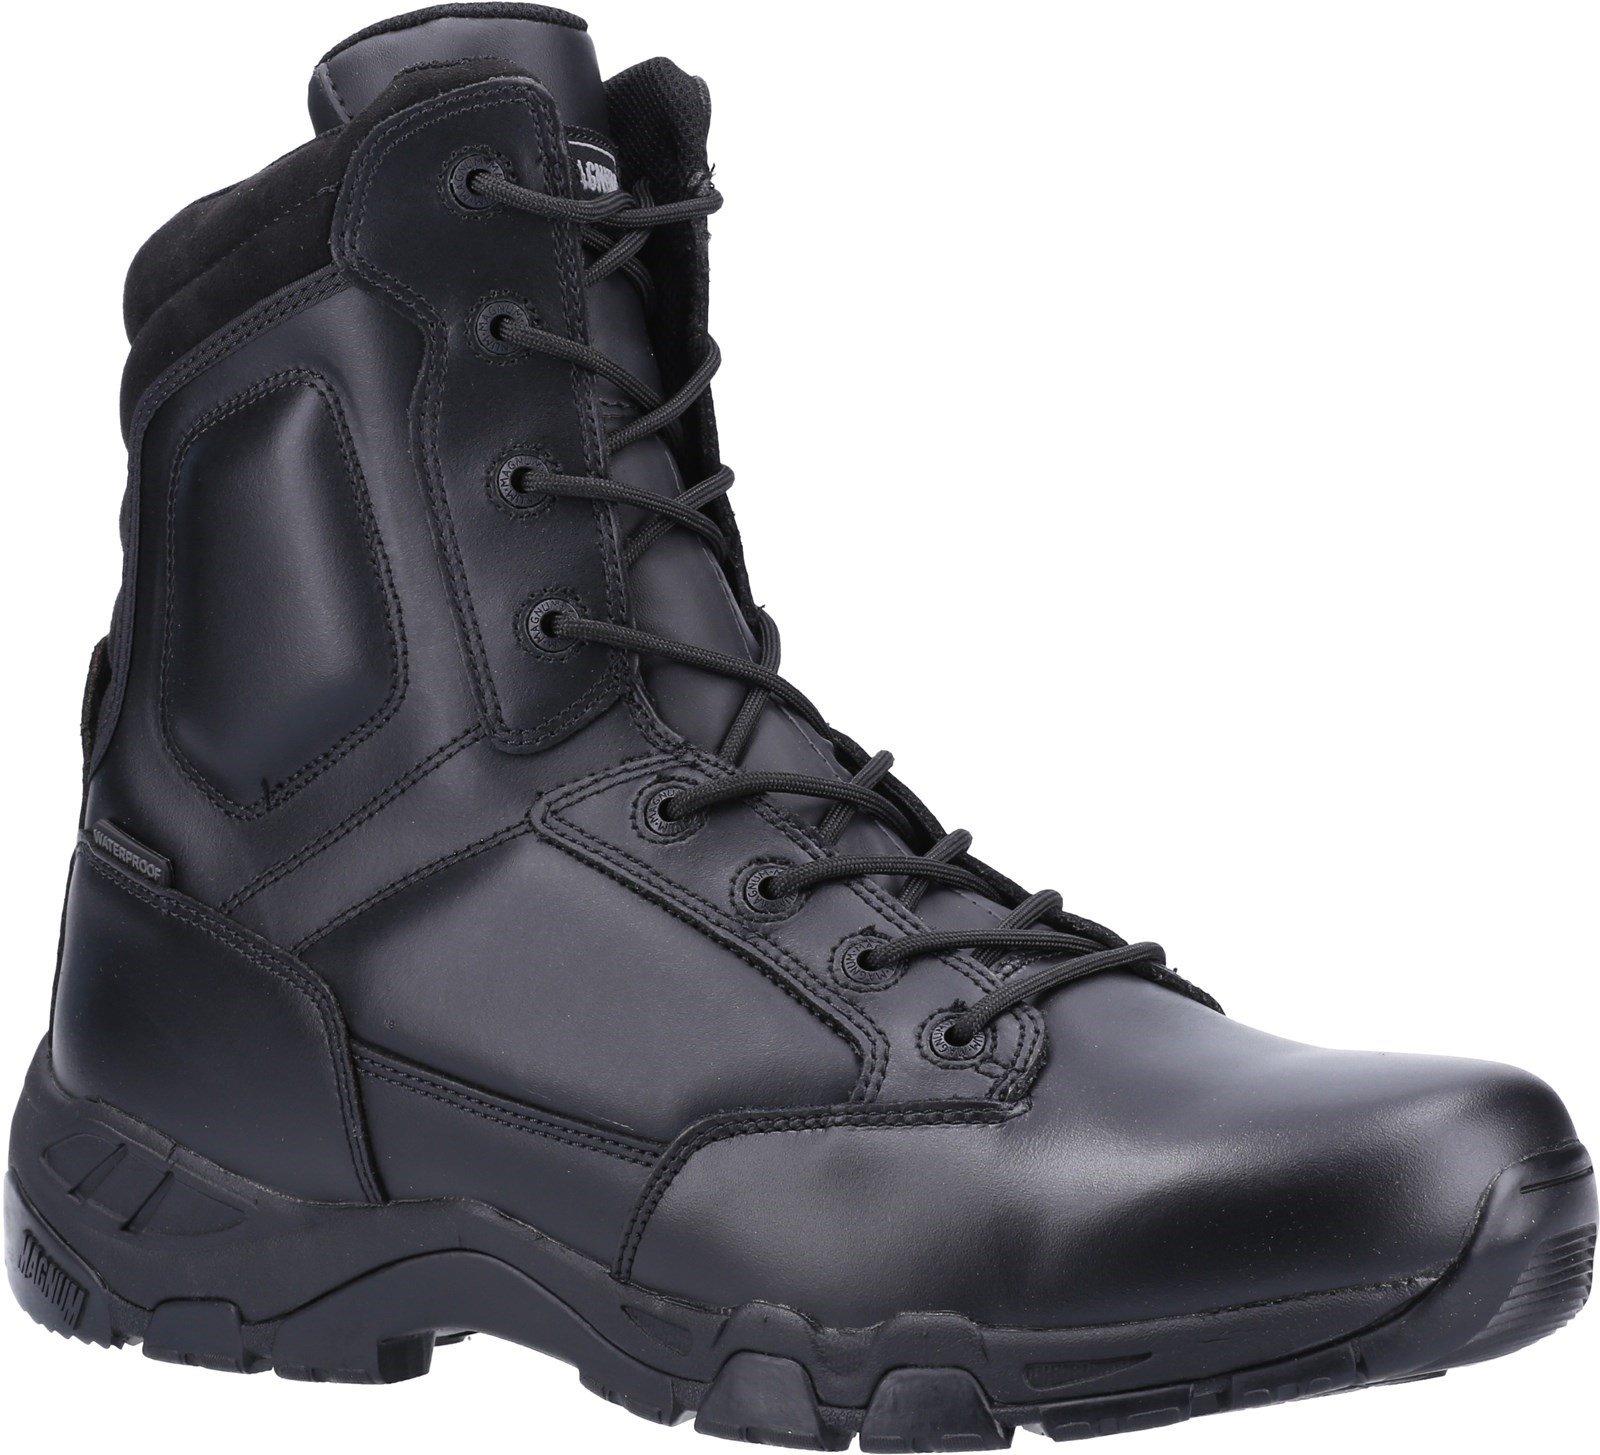 Magnum Men's Viper Pro 8 Plus Uniform Safety Boot Black 33471 - Black 4